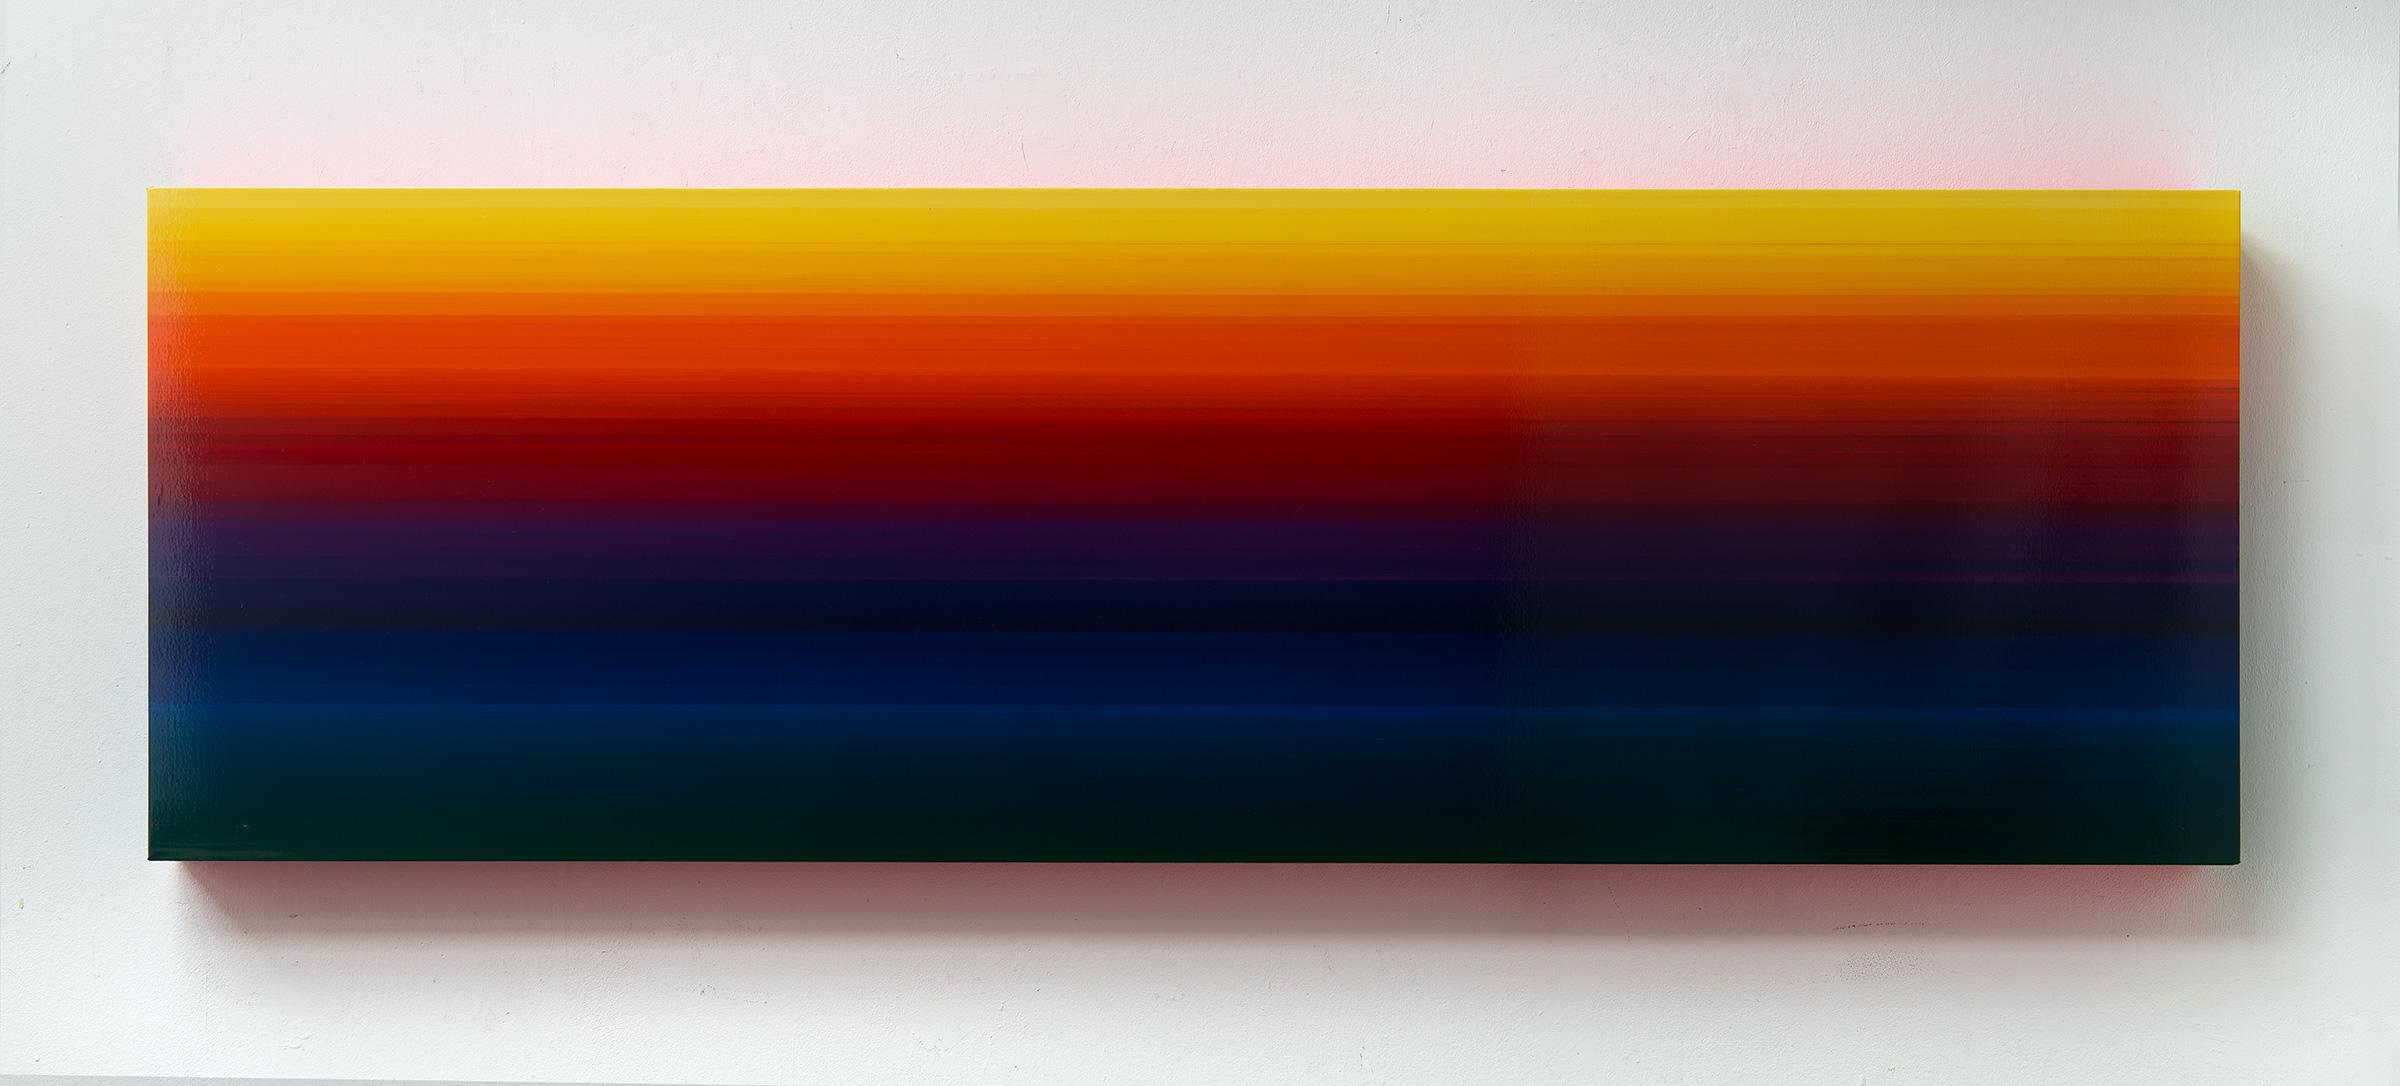 Technicolor-Large-Panorama-Radiant - Thierry Feuz - Leonhard's Gallery